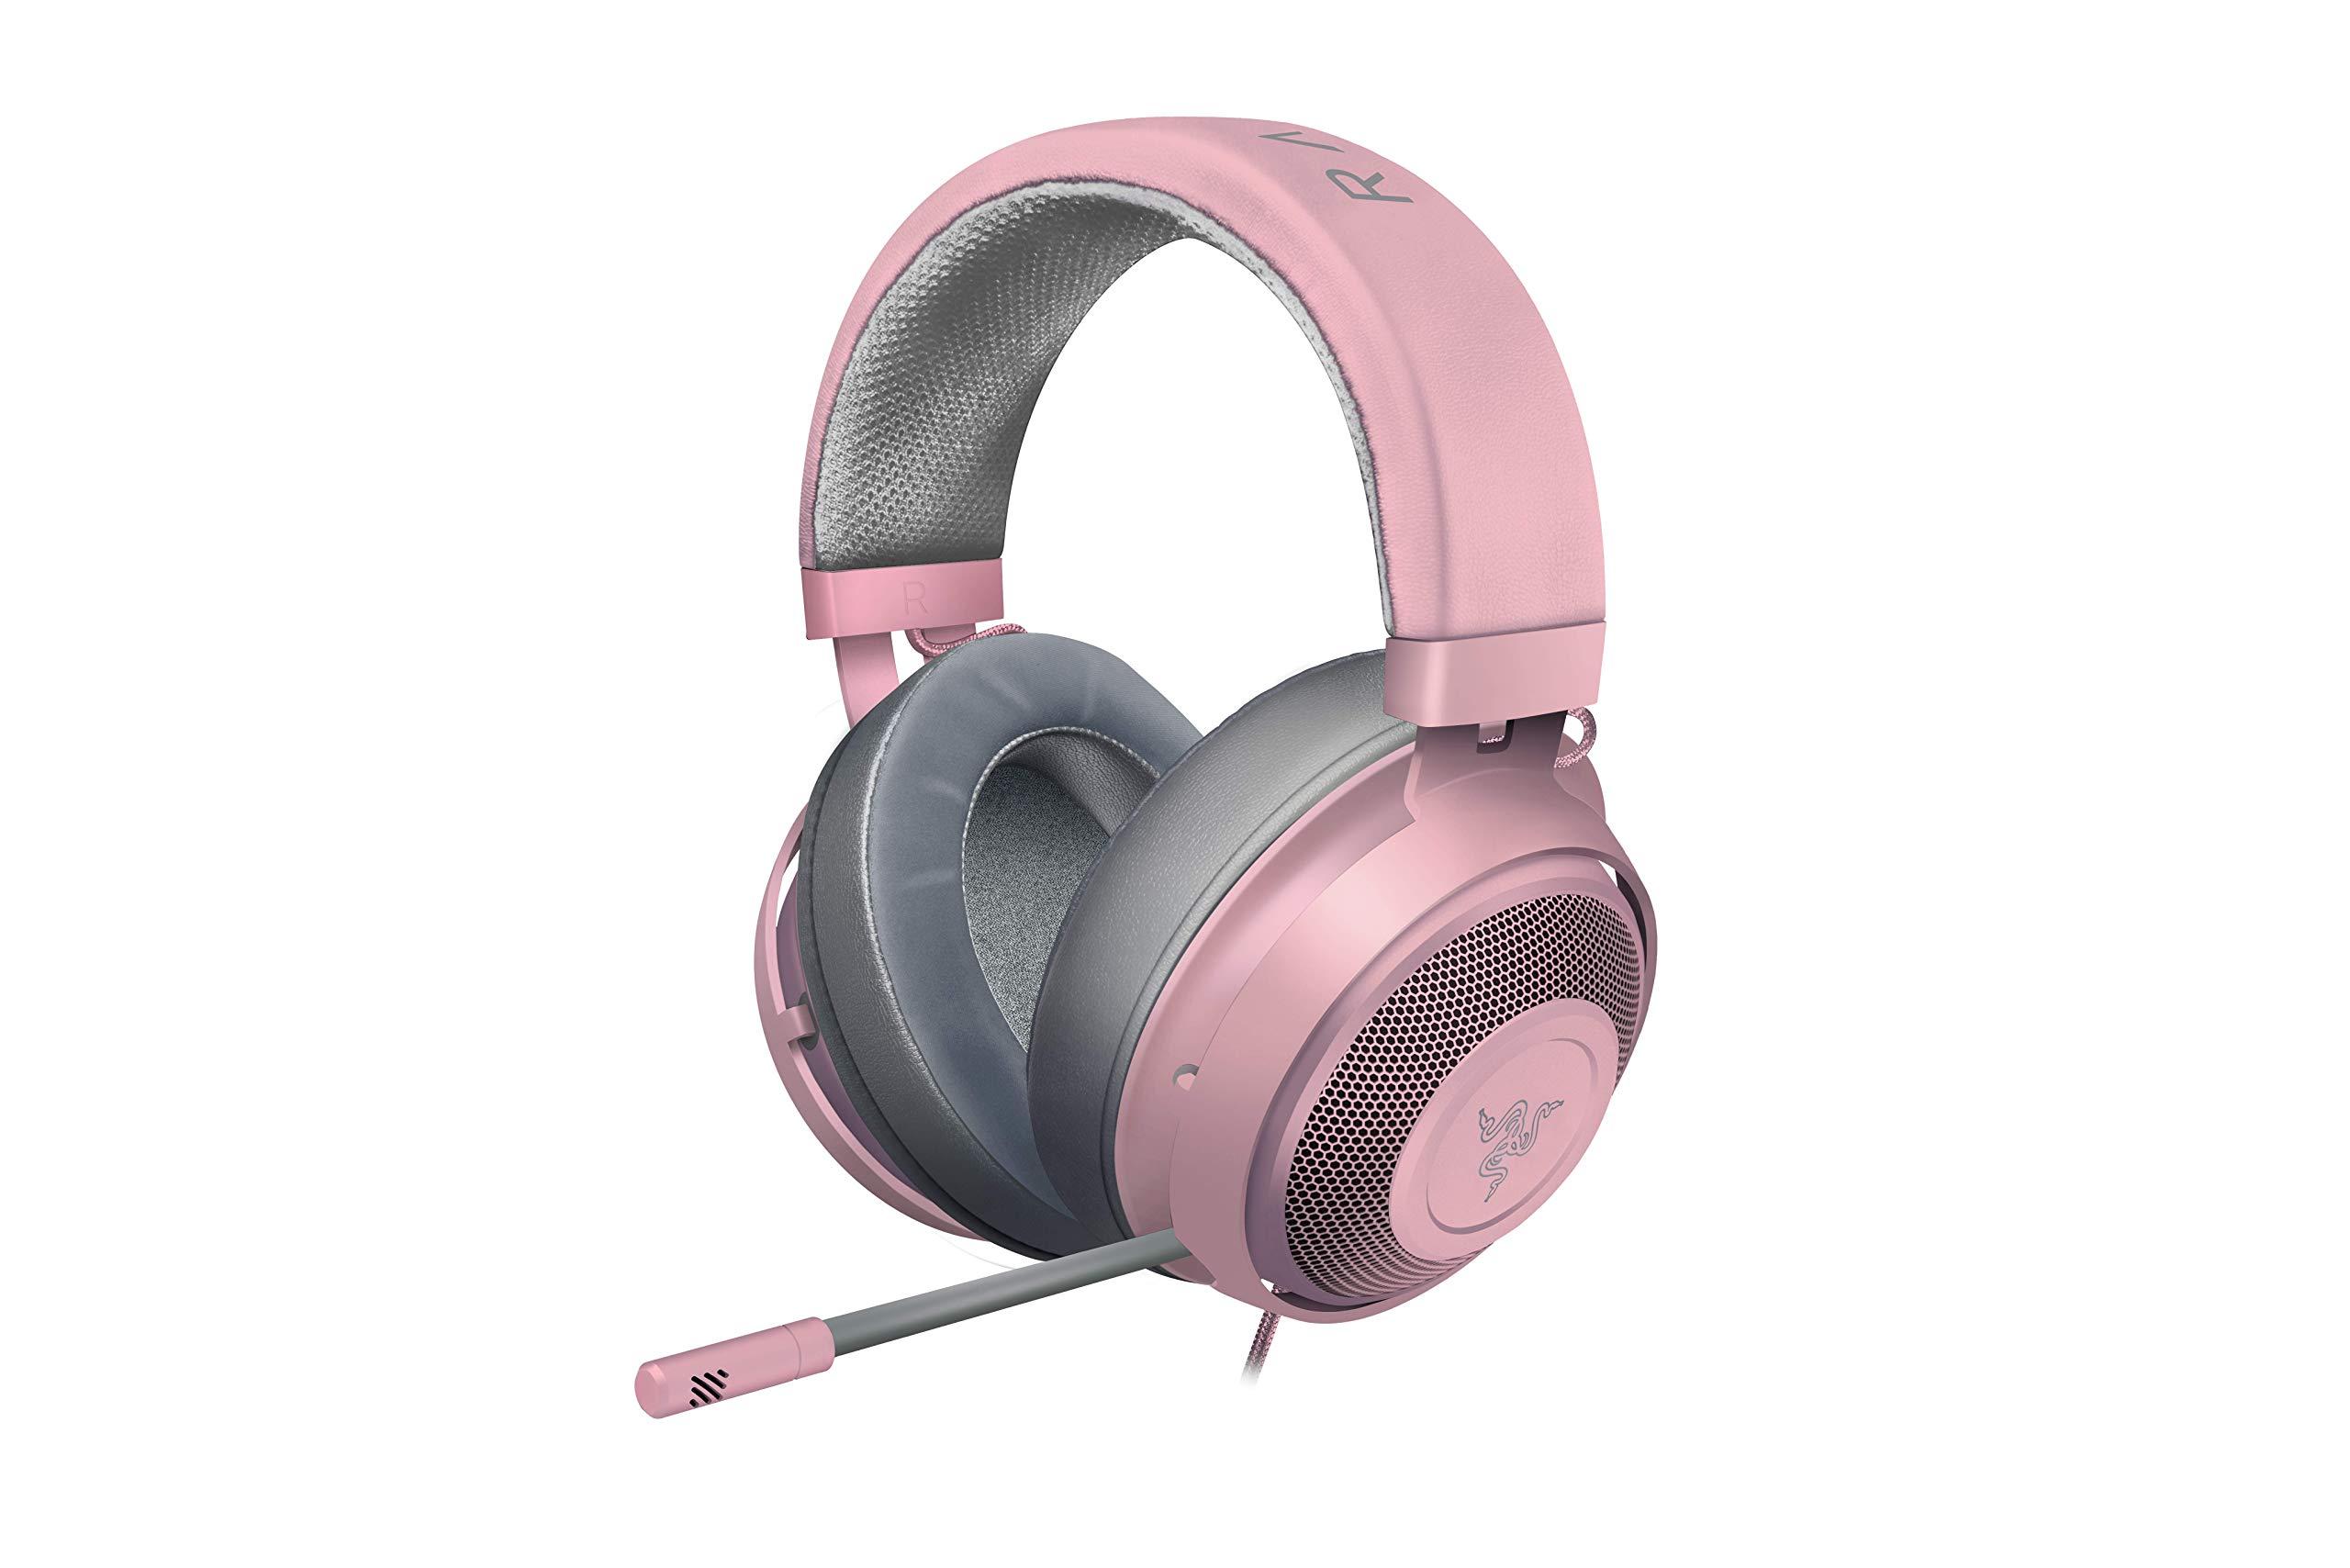 Razer Kraken Gaming Headset 2019 - [Quartz Pink]: Lightweight Aluminum Frame - Retractable Noise Cancelling Mic - for PC, Xbox, PS4, Nintendo Switch